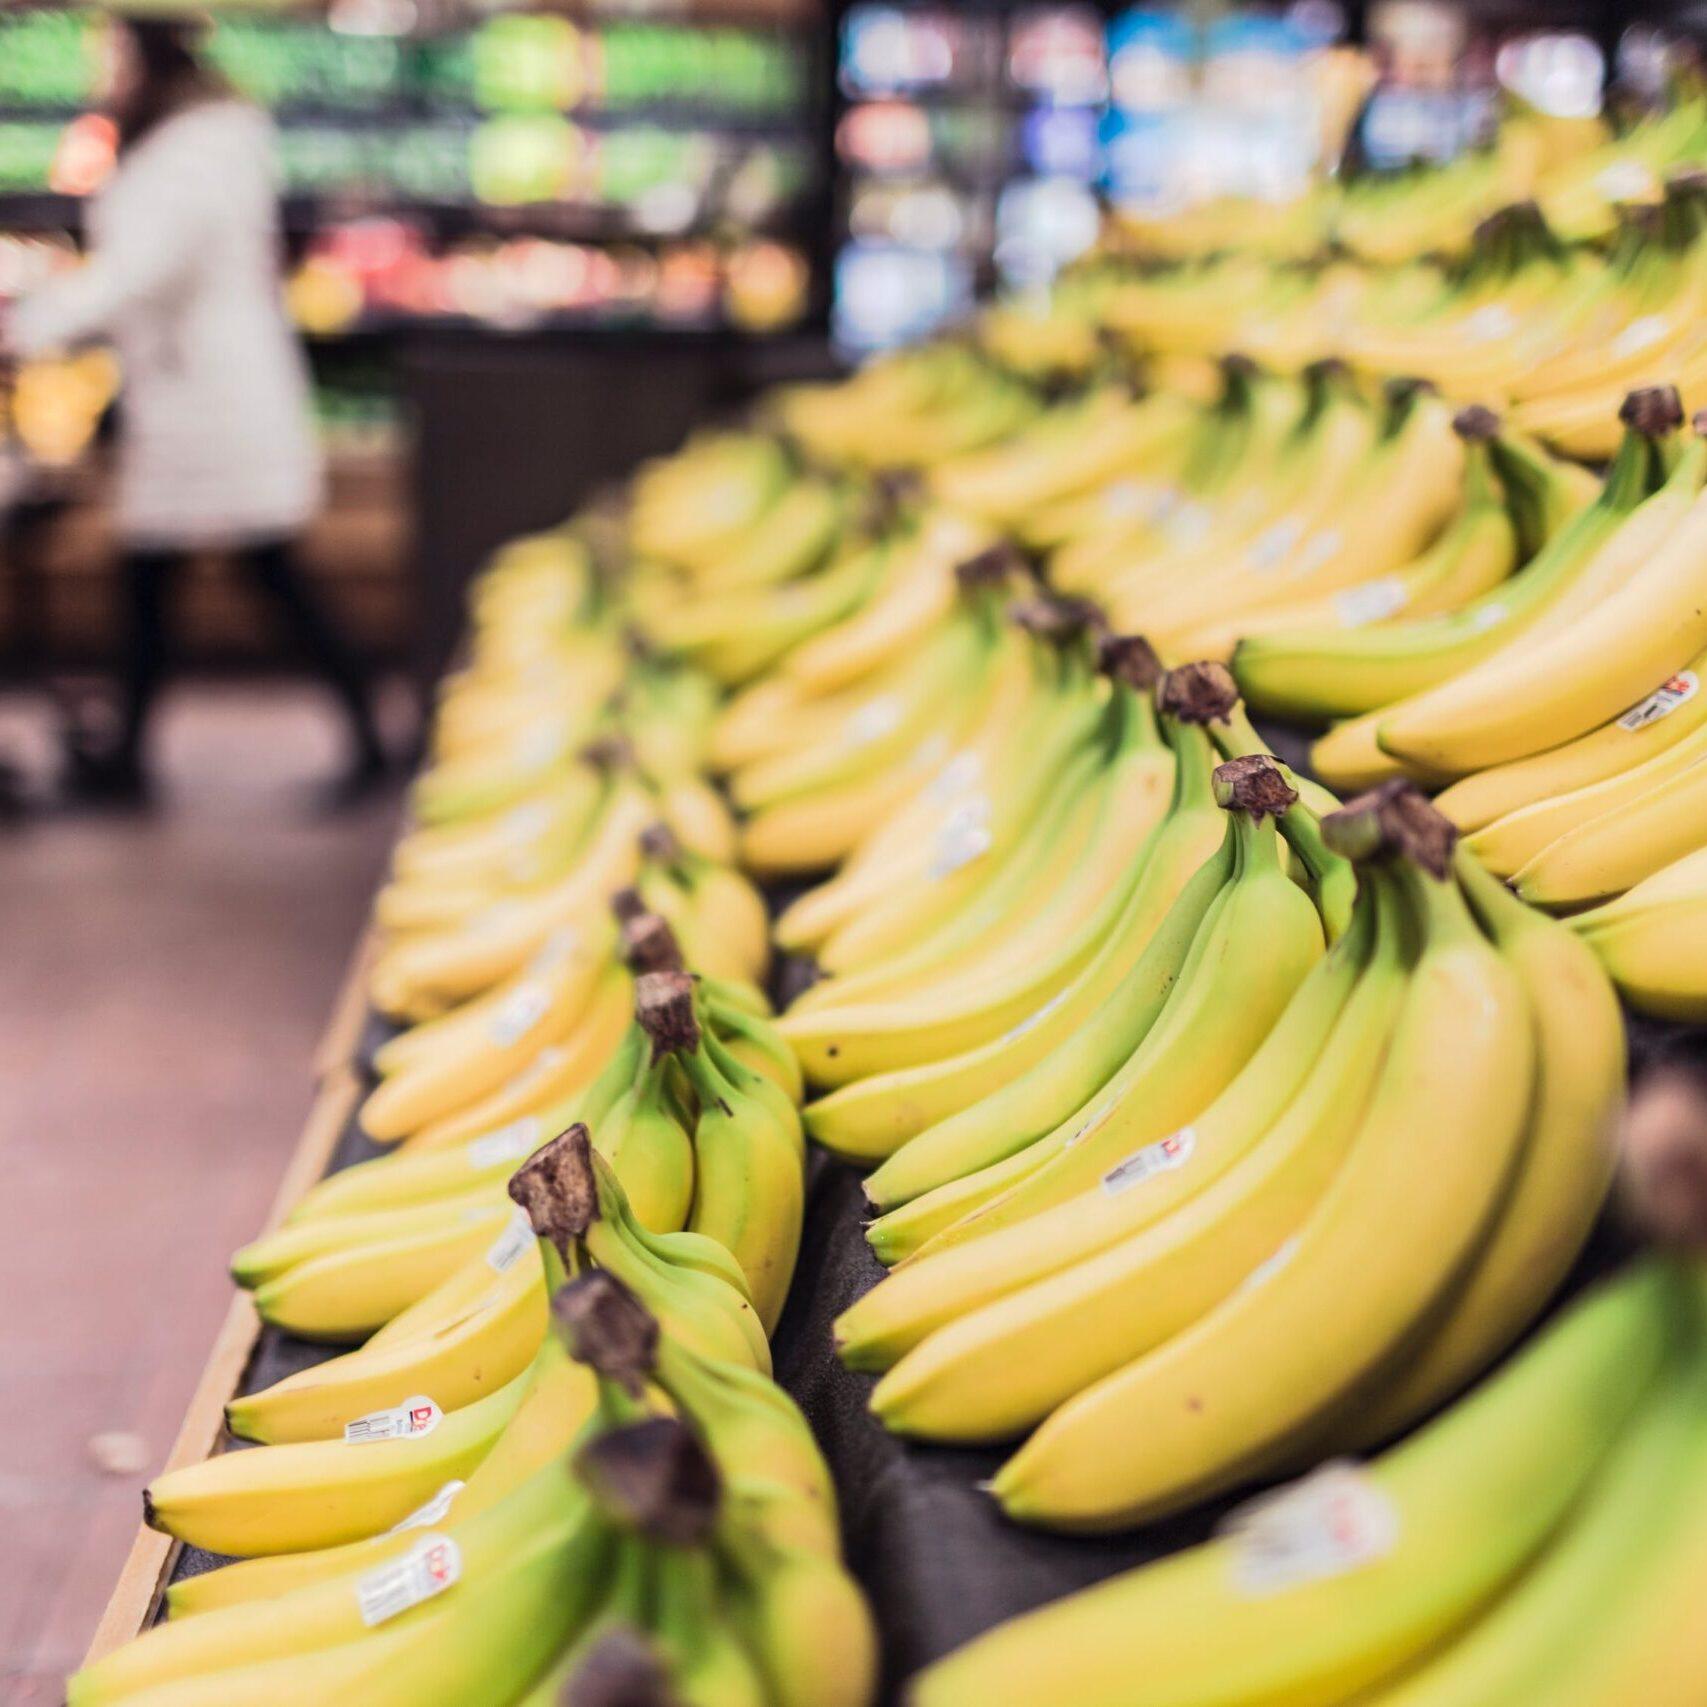 BananasintheGrocery